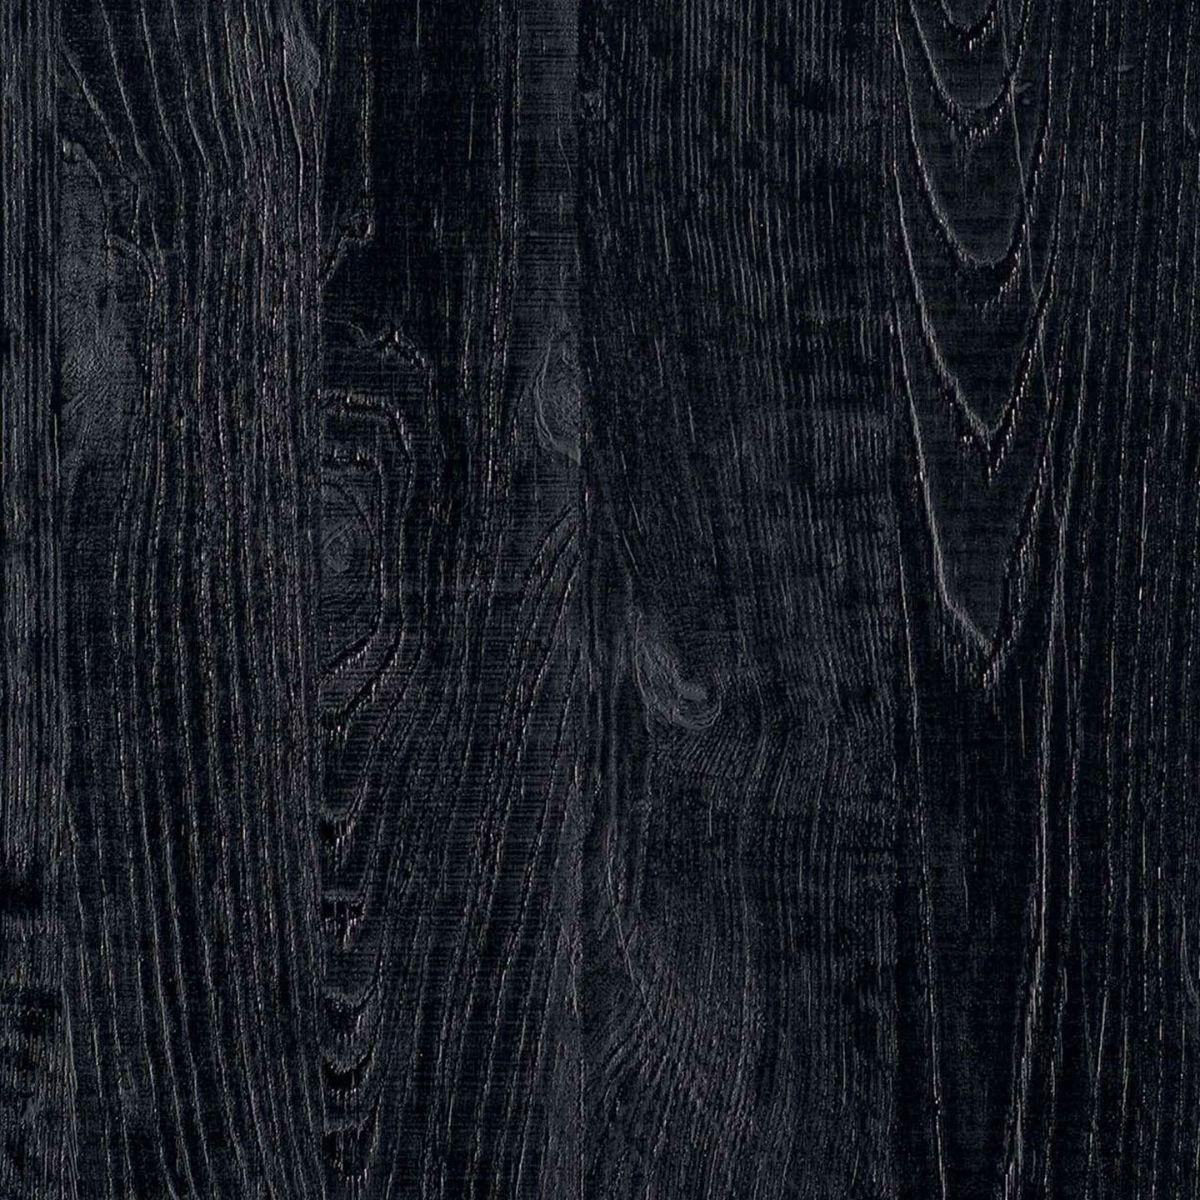 Finish black sherwood panels for glass wall